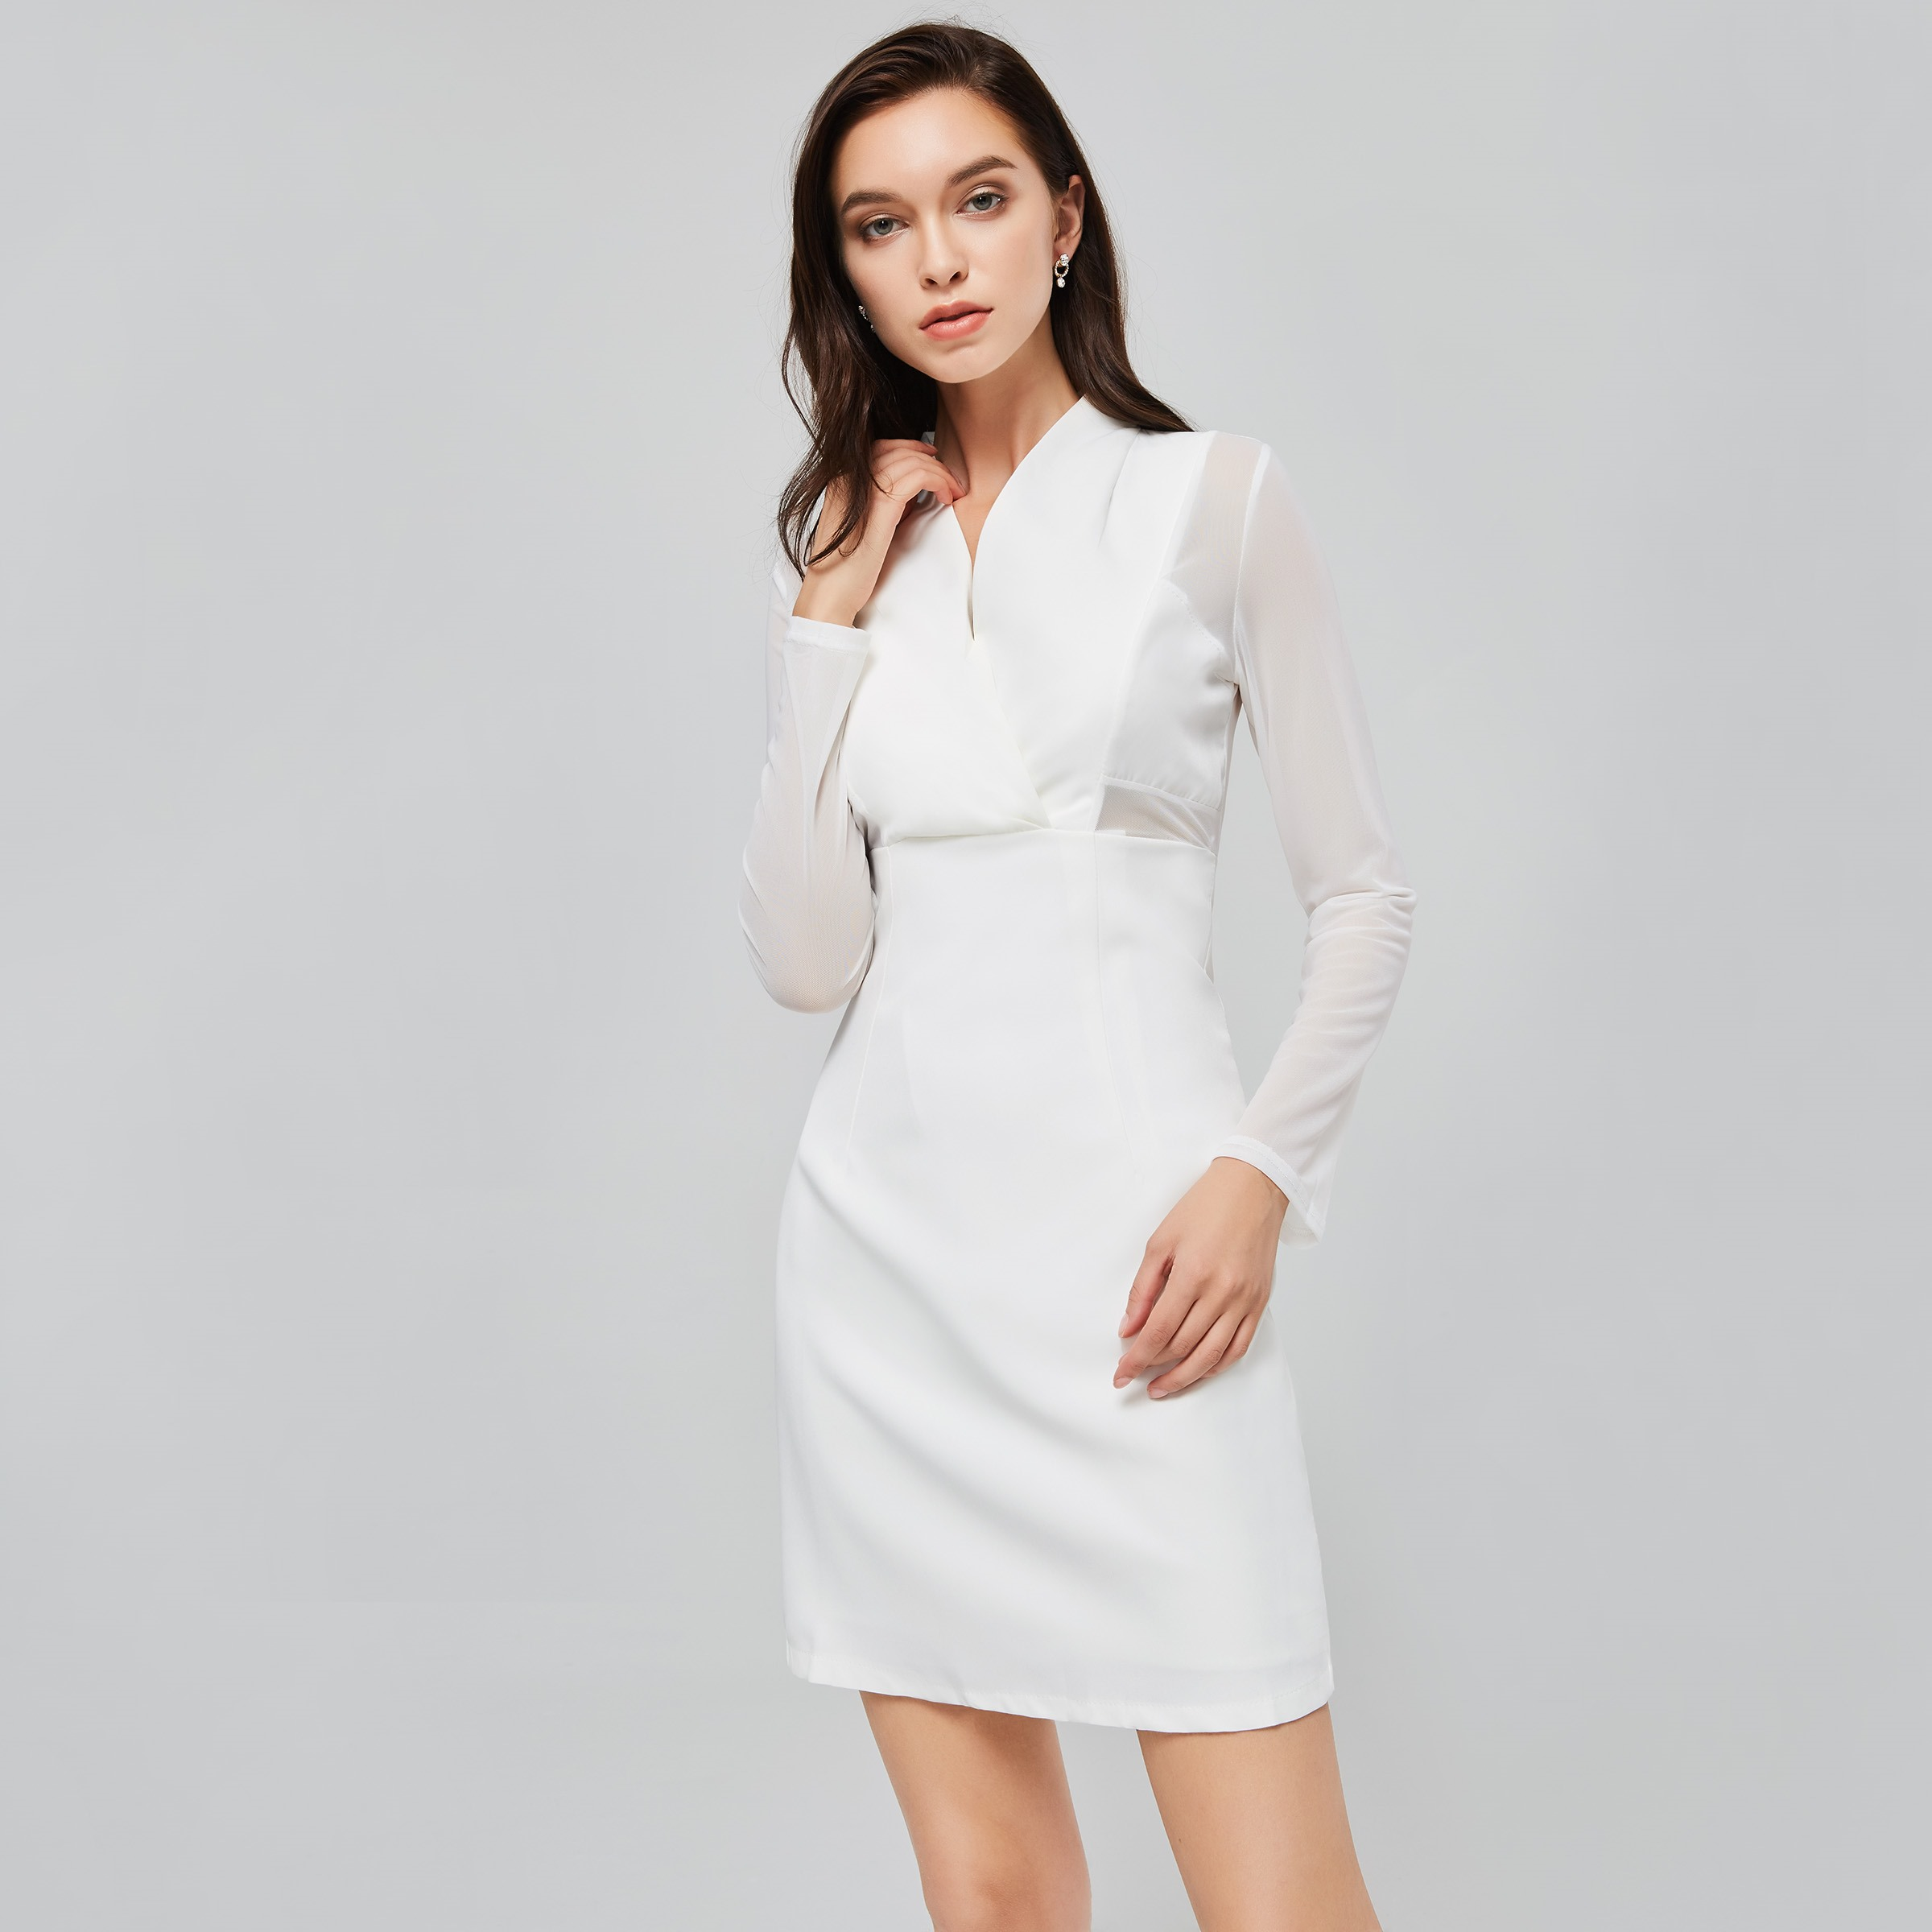 Aliexpress Com Buy Simple Elegant See Through Lace Part: White Sexy Bodycon Dress Women Autumn 2018 Mesh Sleeve See